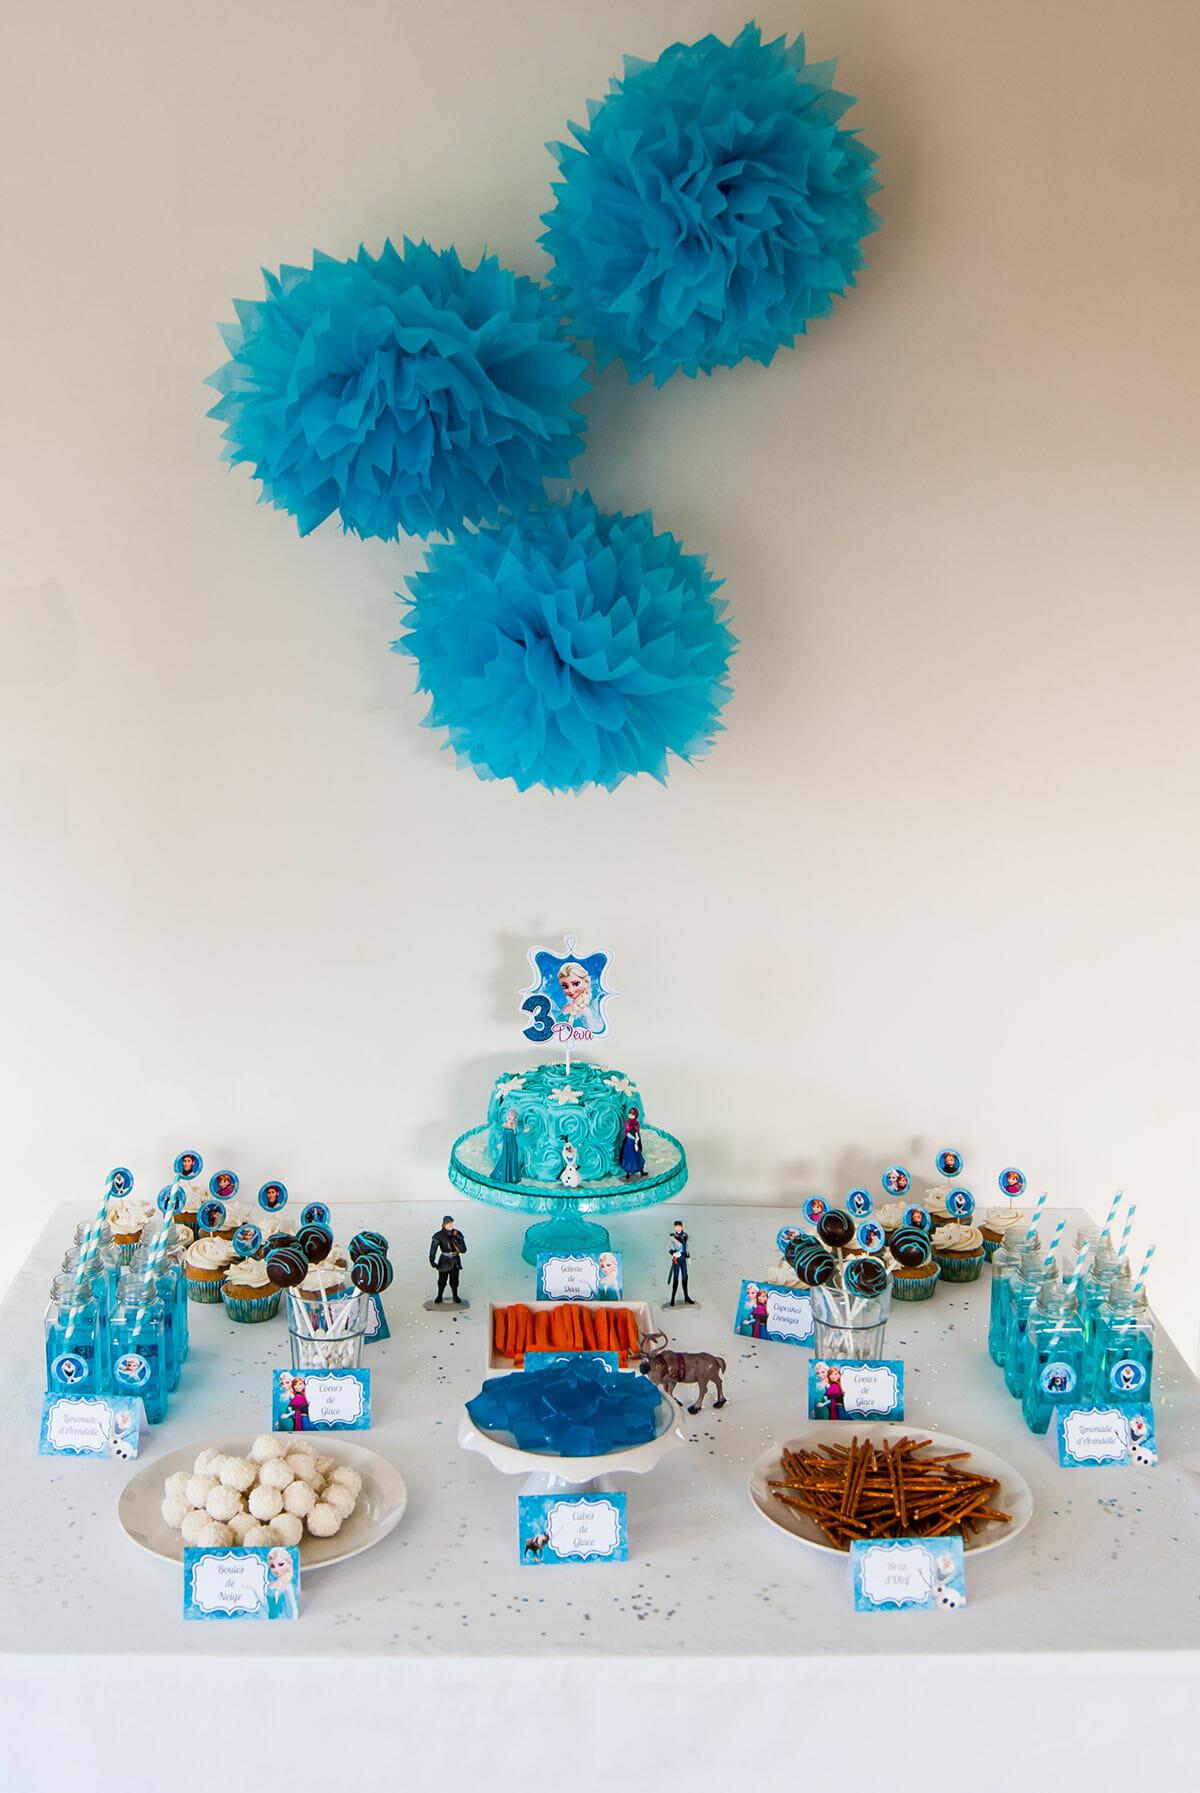 Sweet table anniversaire reine des neiges lilie bakery - Reine de neige 2 ...